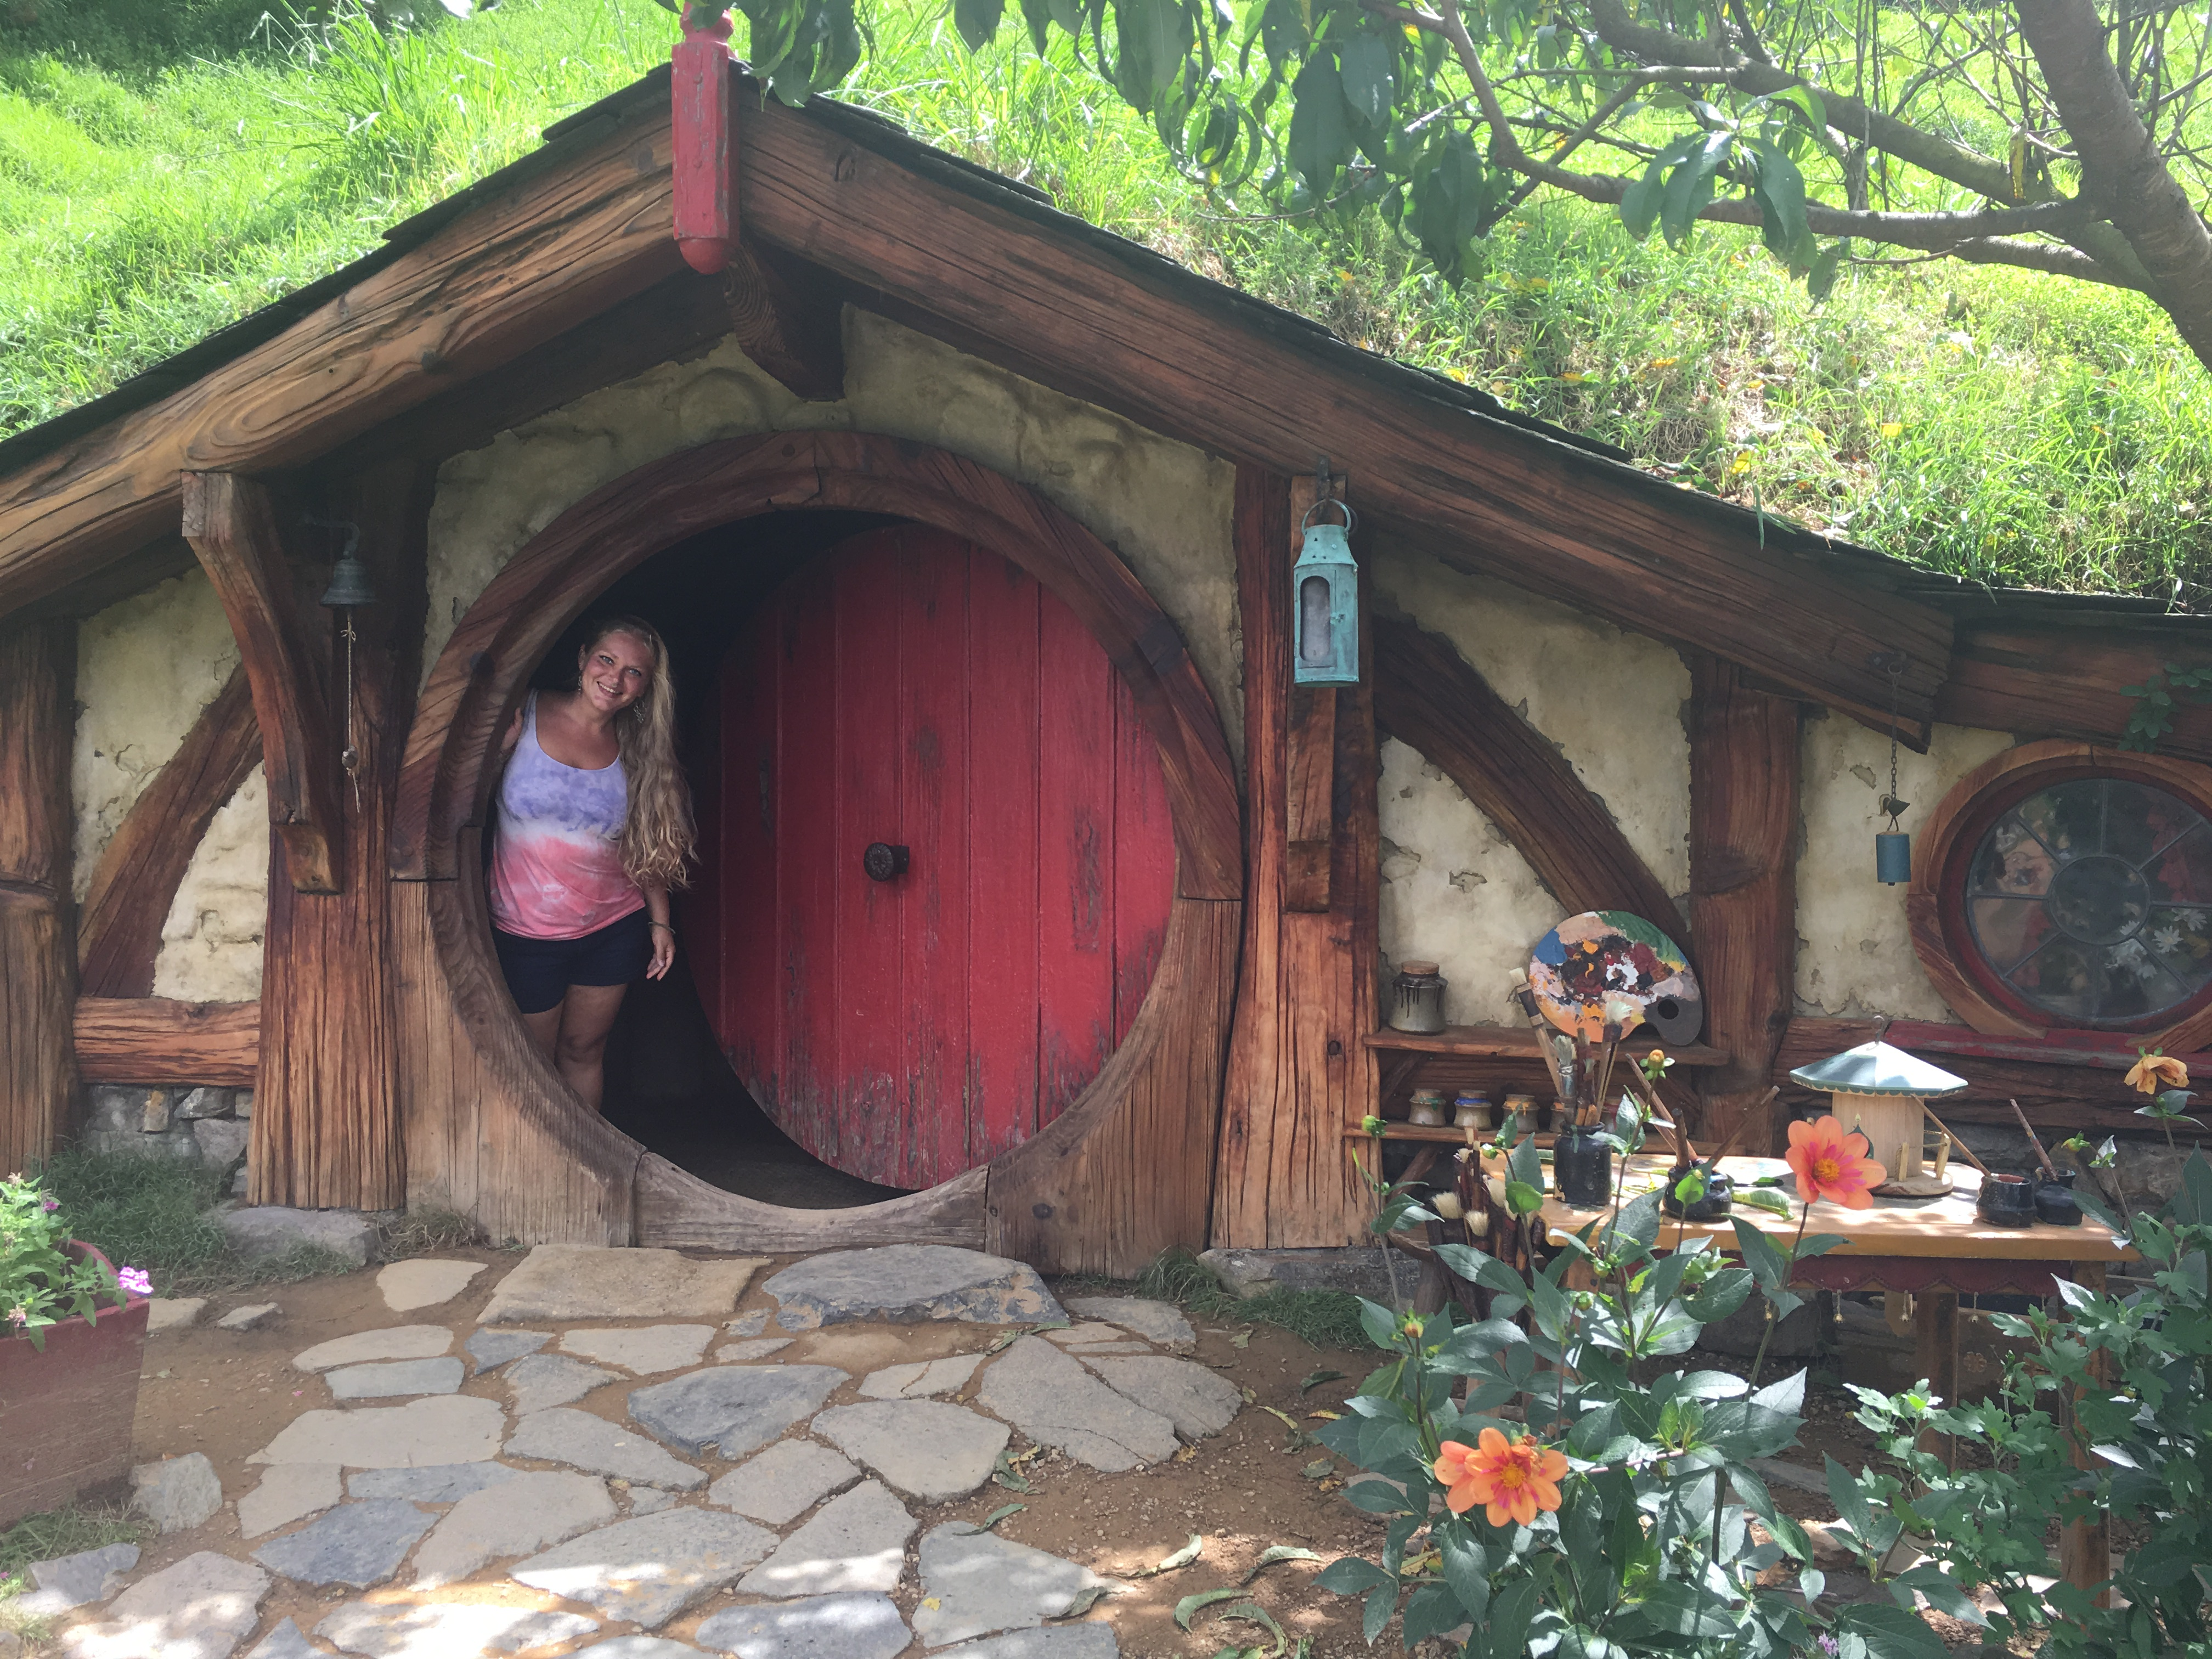 Manjulali in Hobbiton, Neuseeland